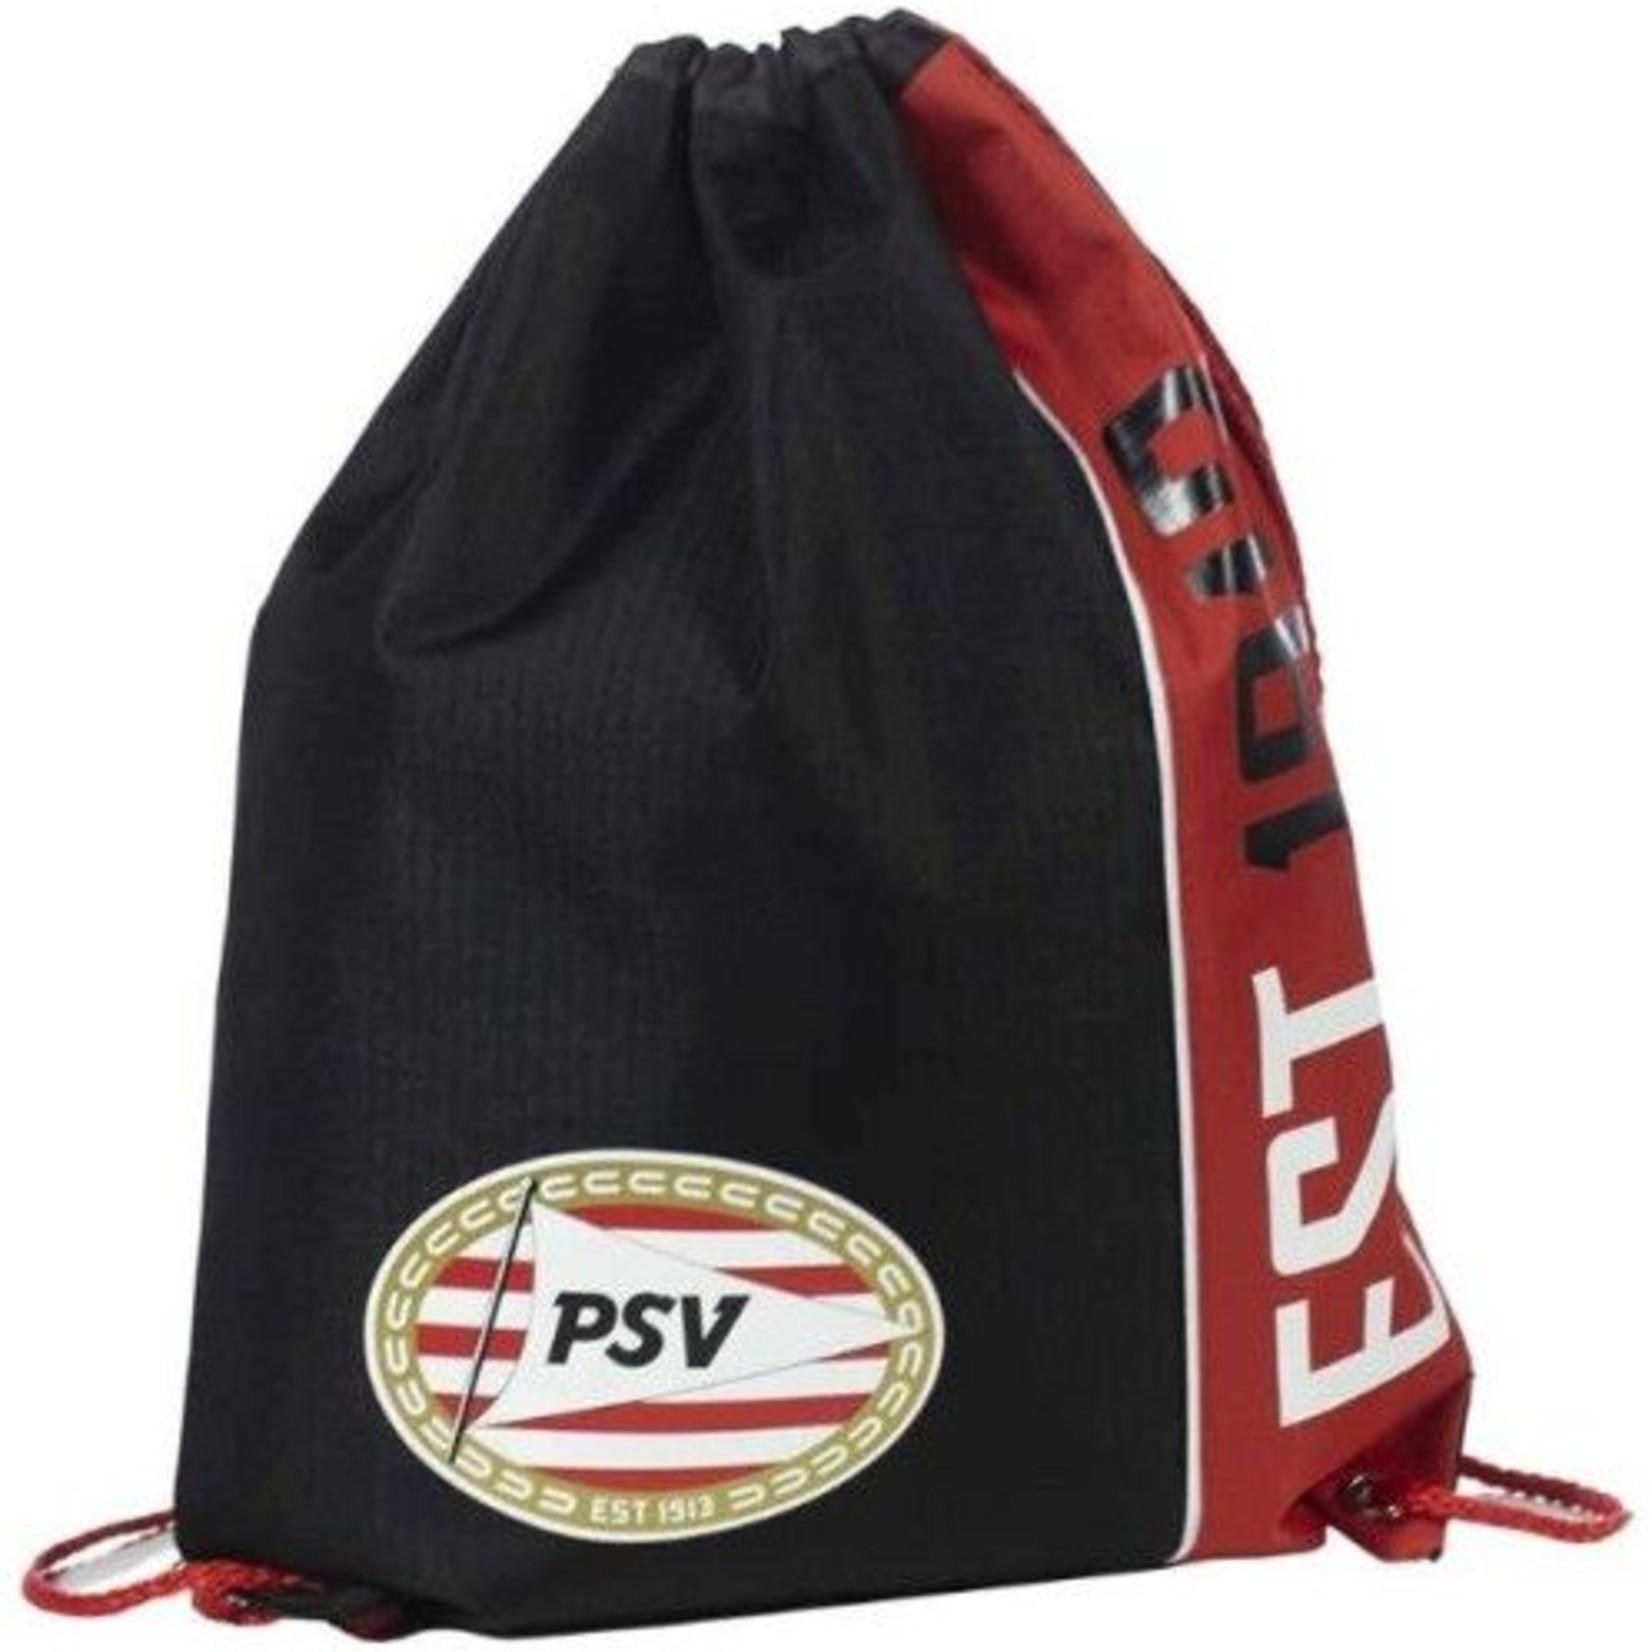 PSV Zwemtas psv zwart/rood: 41x33 cm